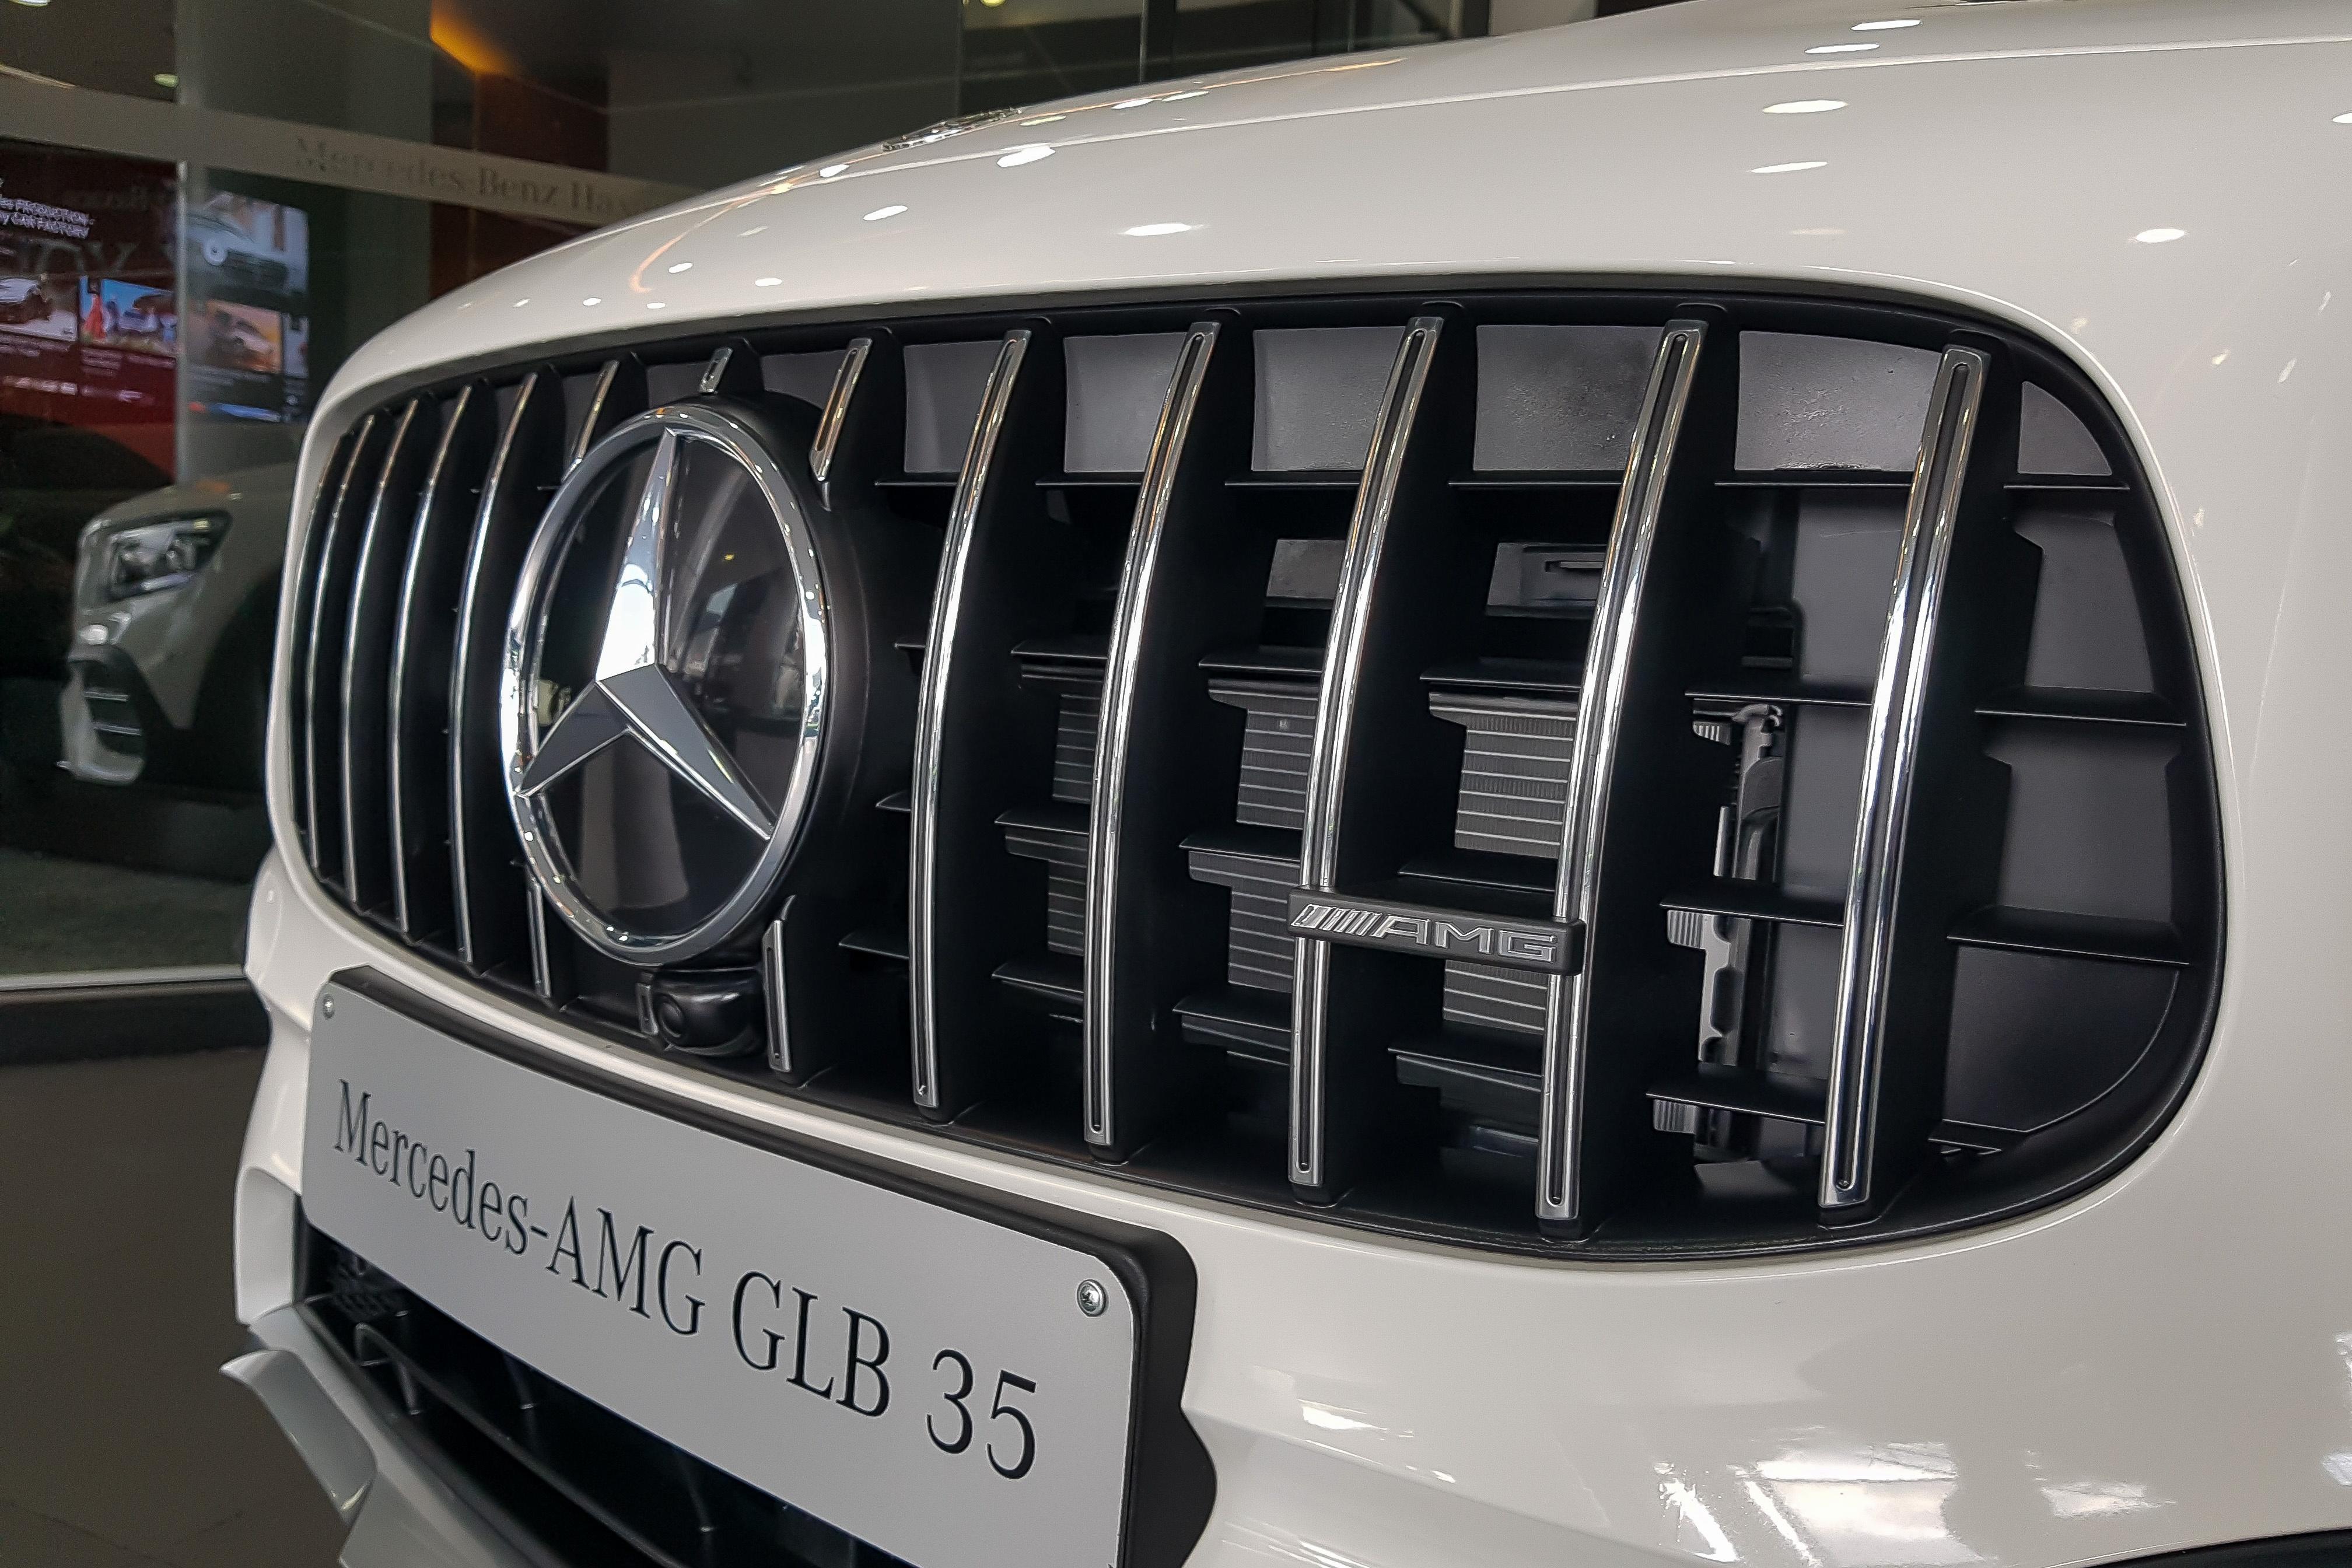 Mercedes-AMG GLB 35 anh 4